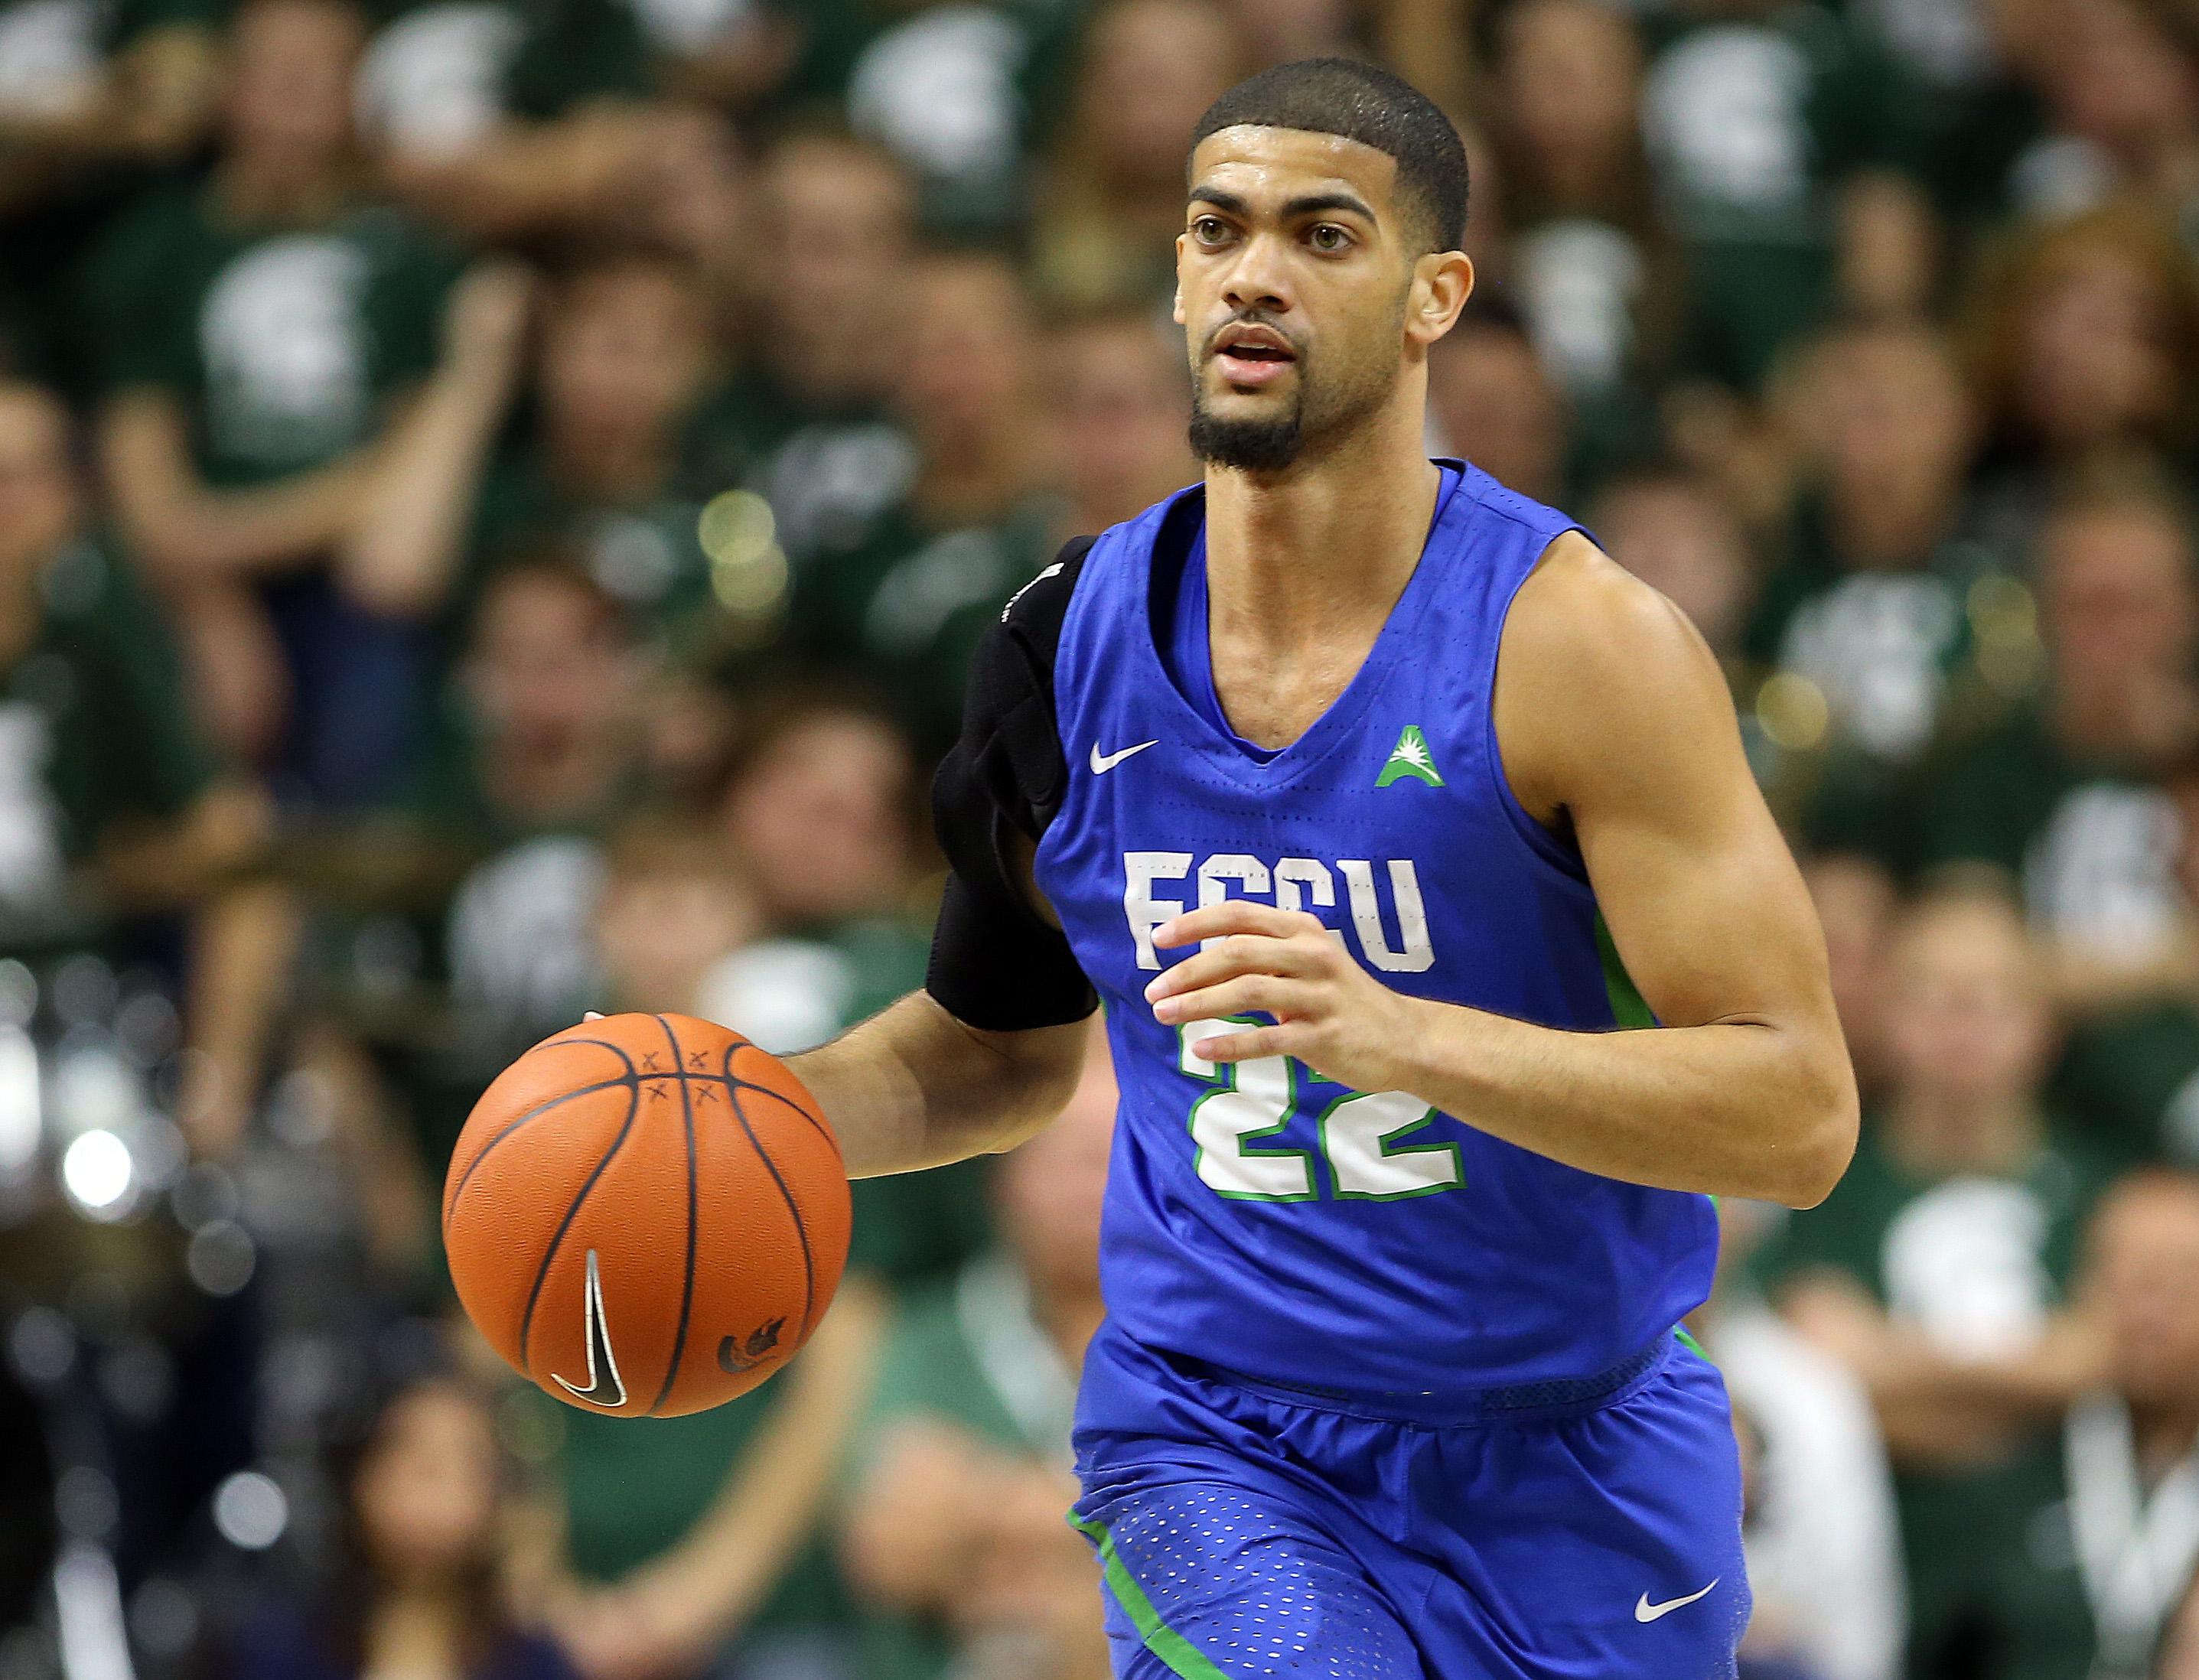 NCAA Basketball: Florida Gulf Coast at Michigan State